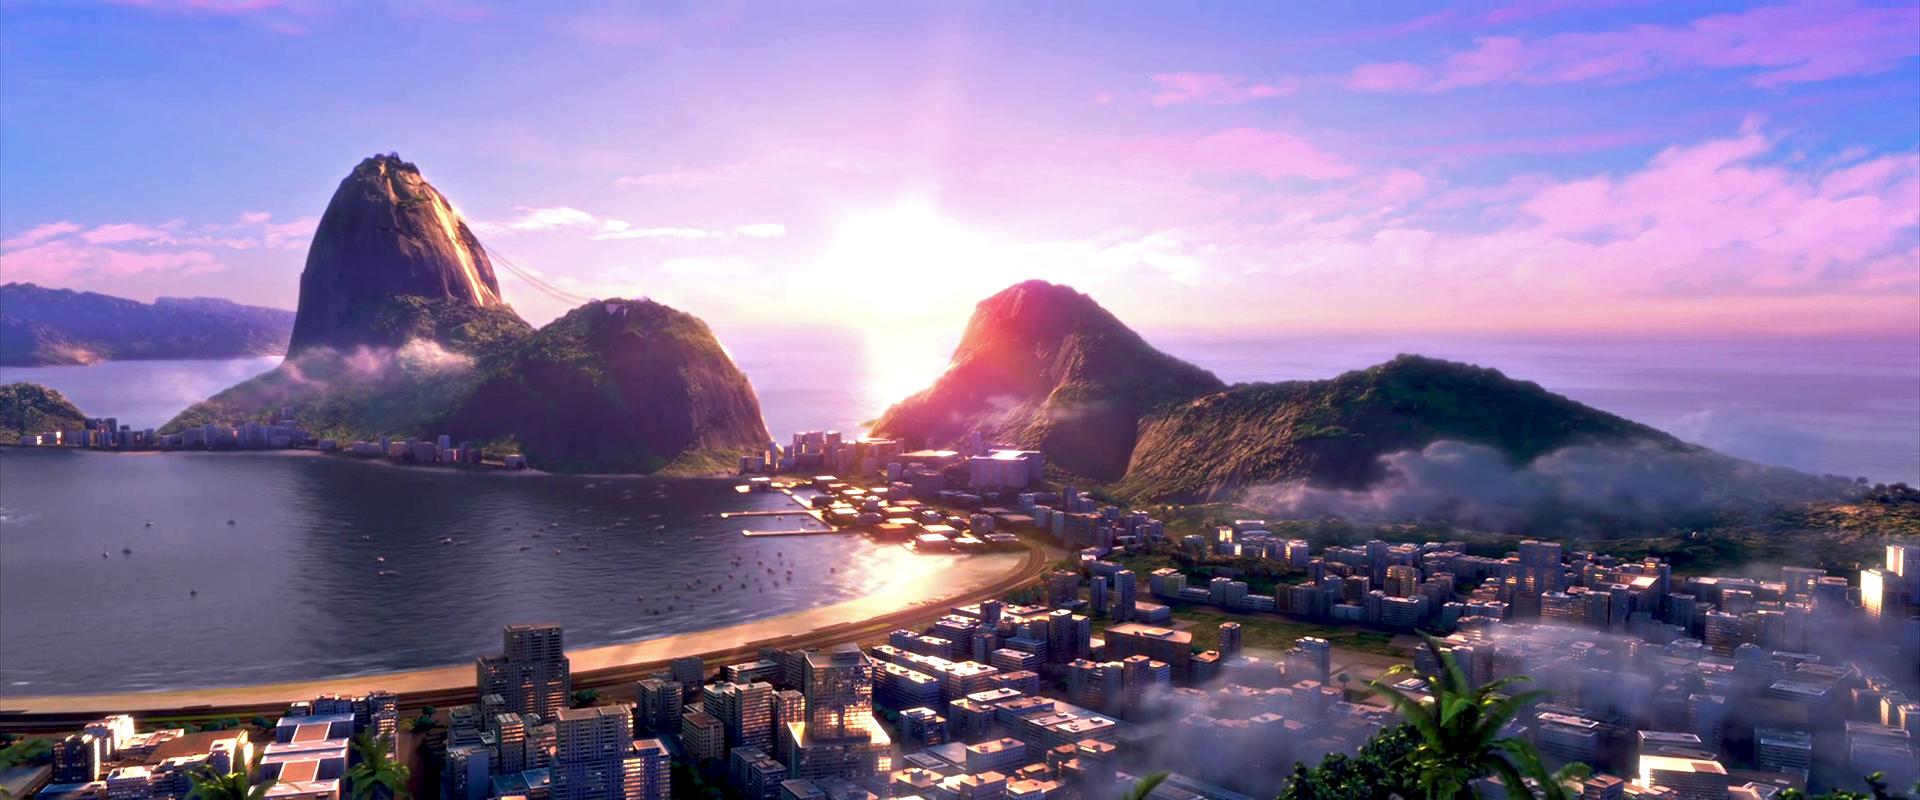 image - rio (movie) wallpaper - scenic view of rio de janeiro